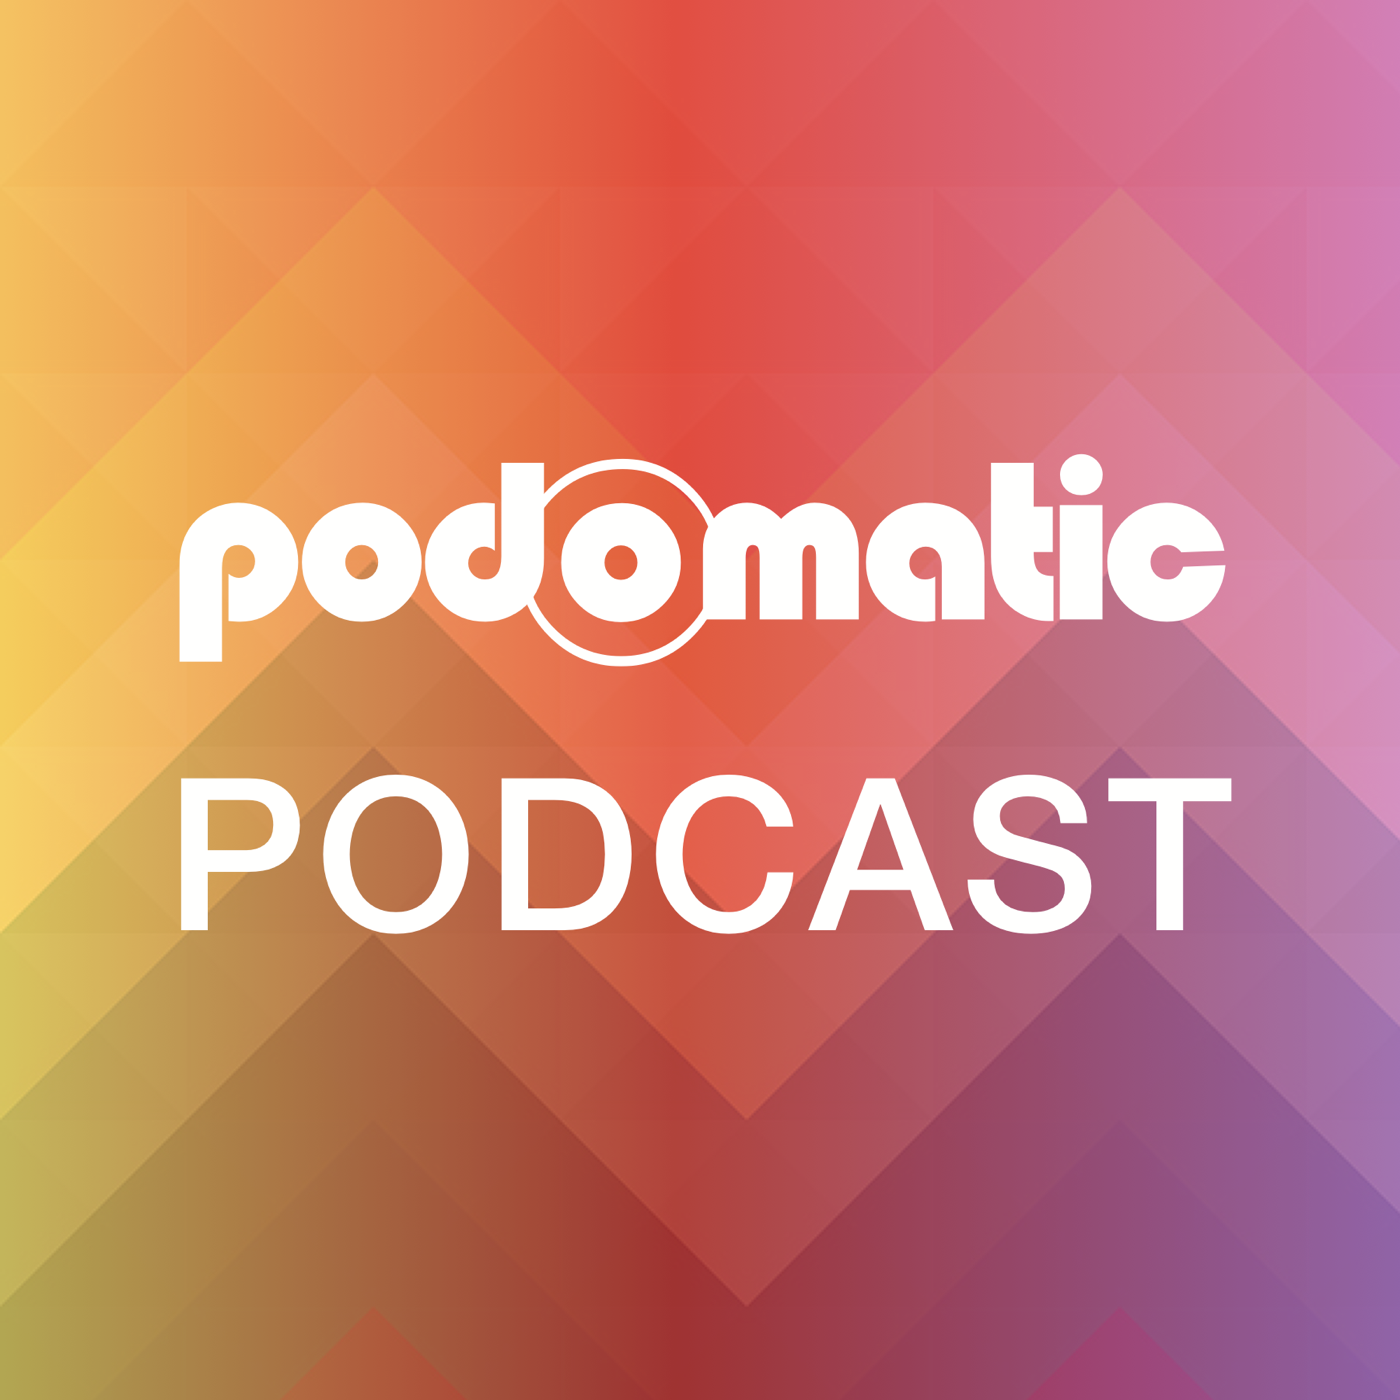 spiritfm's Podcast